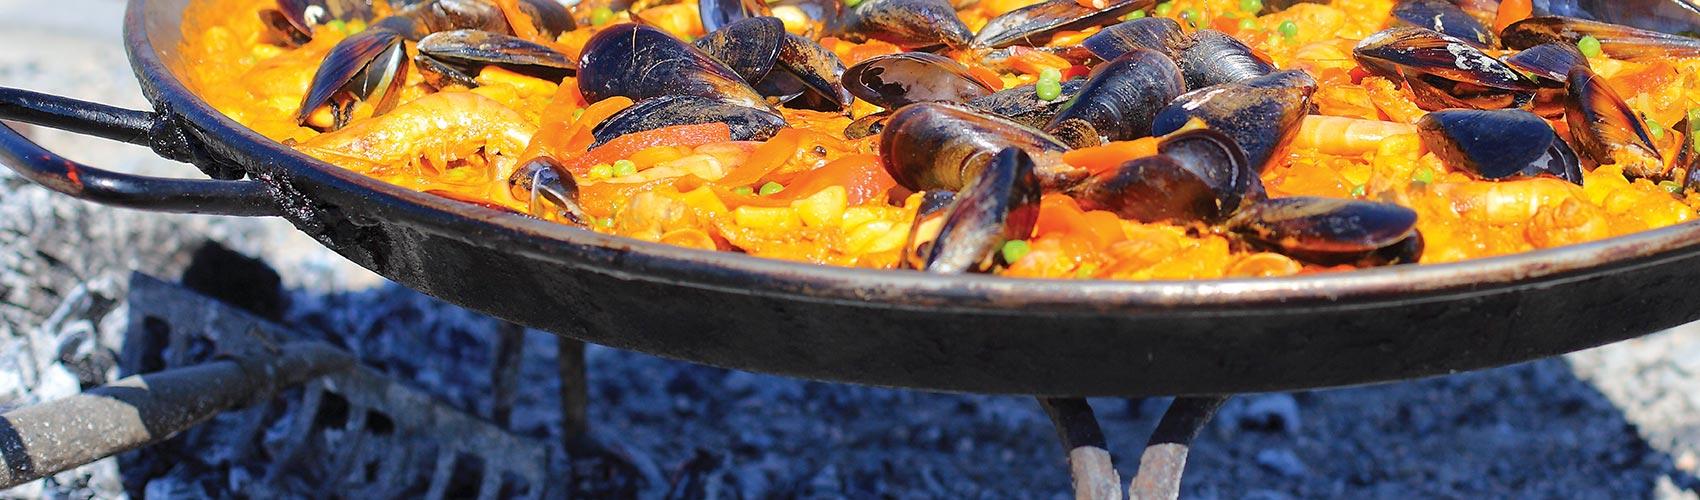 Marbella Gastronomy